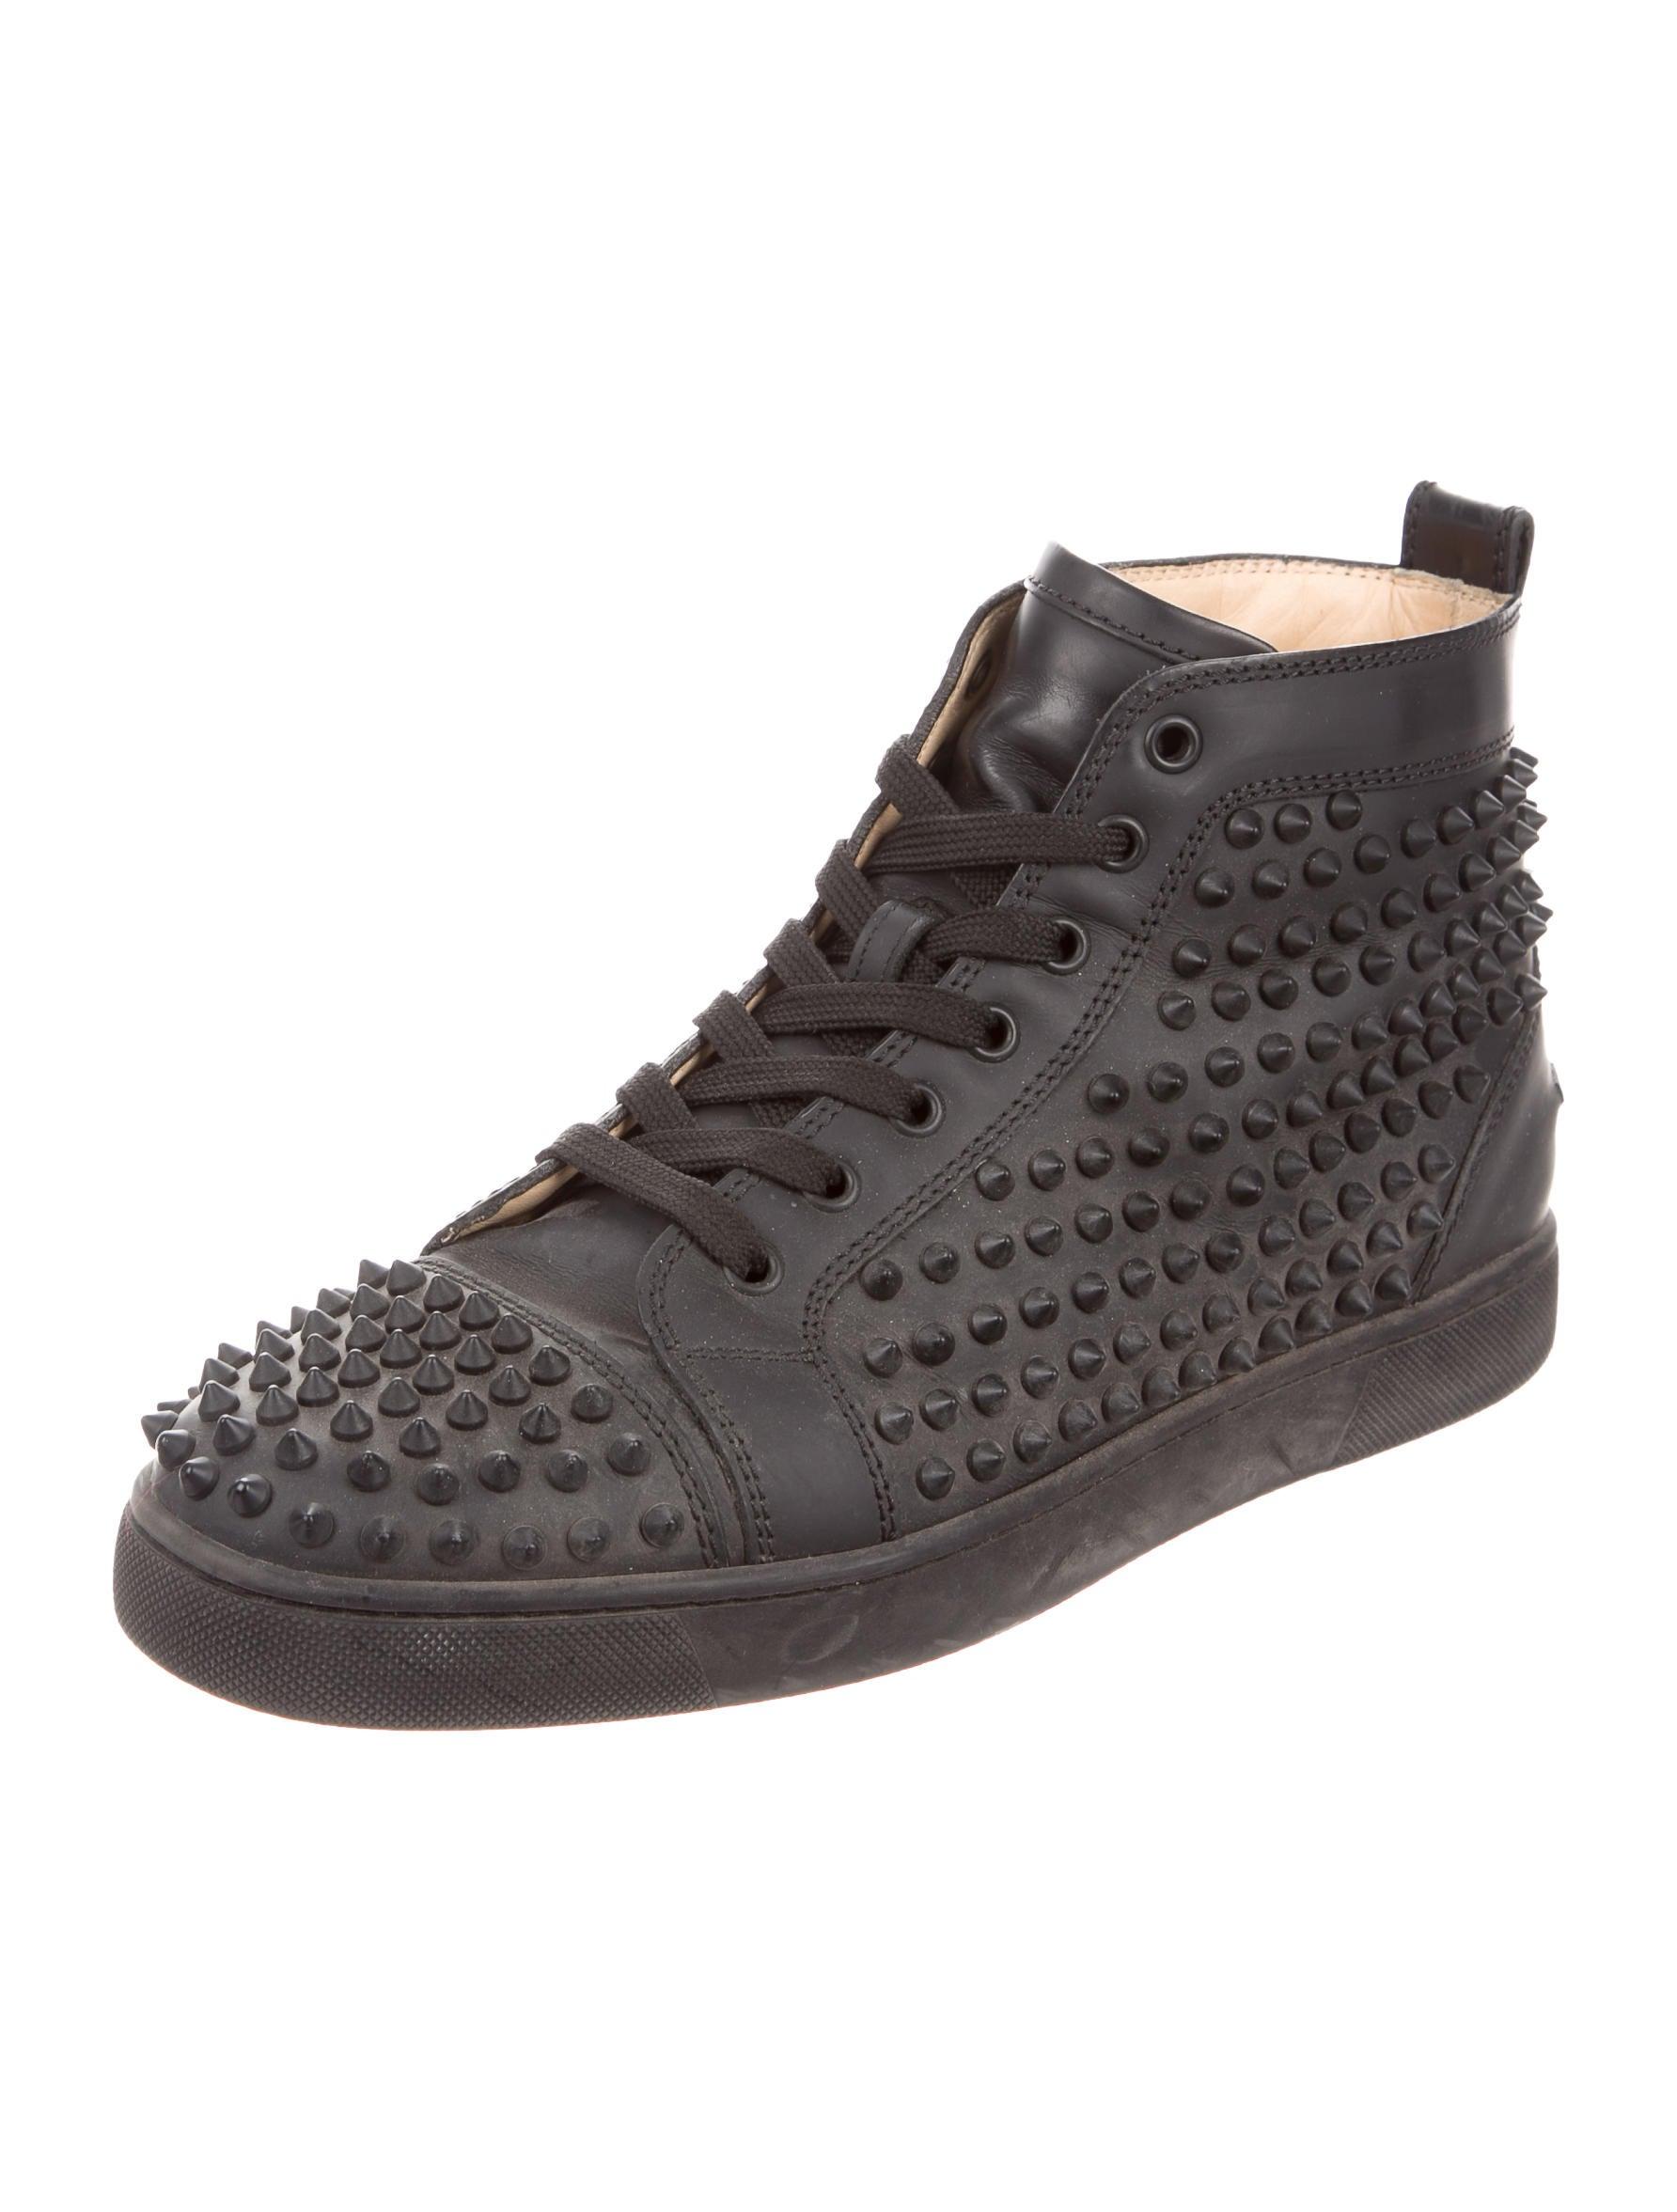 b5a5d18b53c Christian Louboutin Studded Boots Jobs Black Patent Shoes Men ...